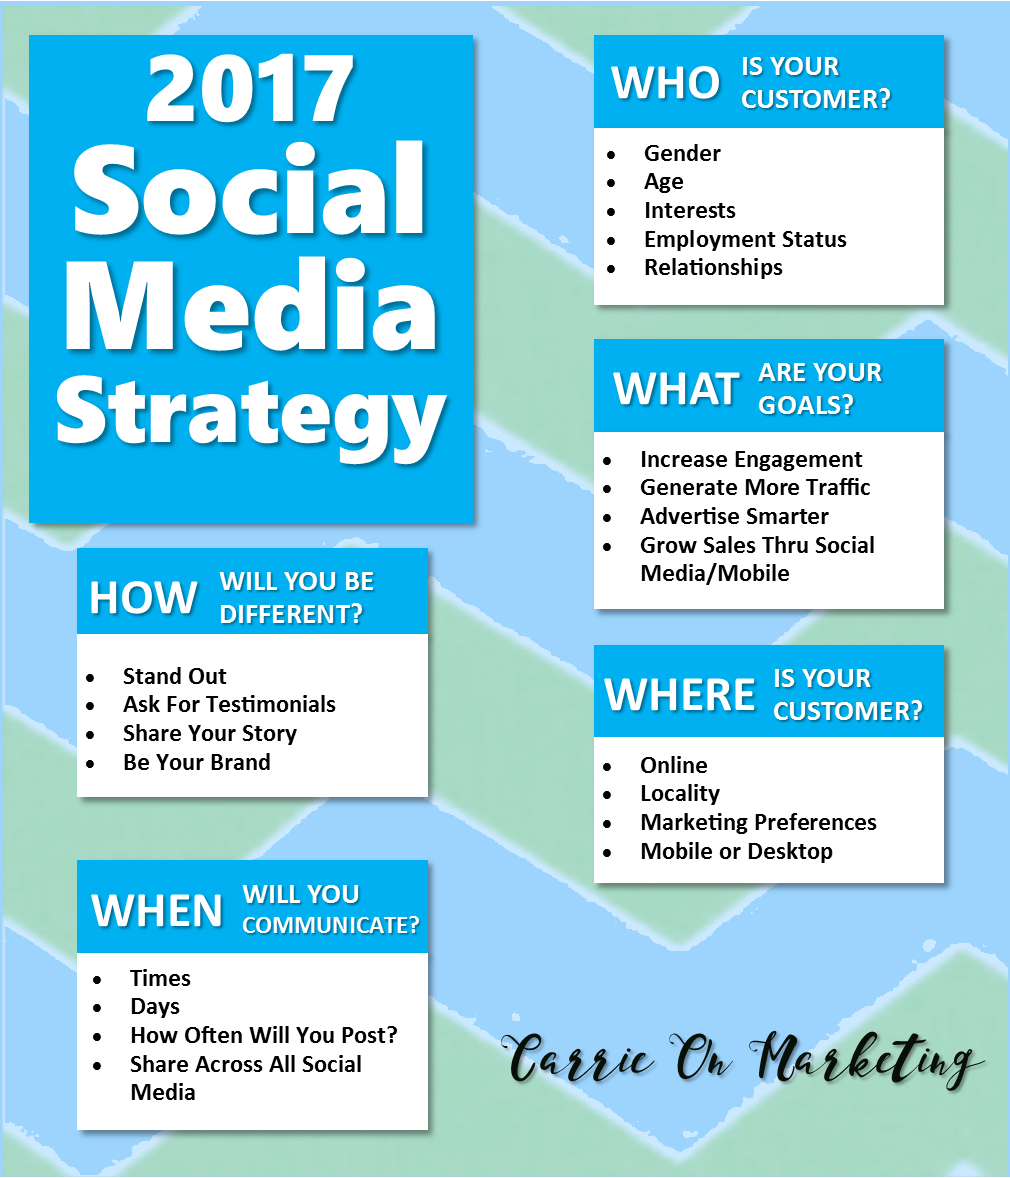 Plan Your 2017 Social Media Strategy TODAY! #socialmedia ...